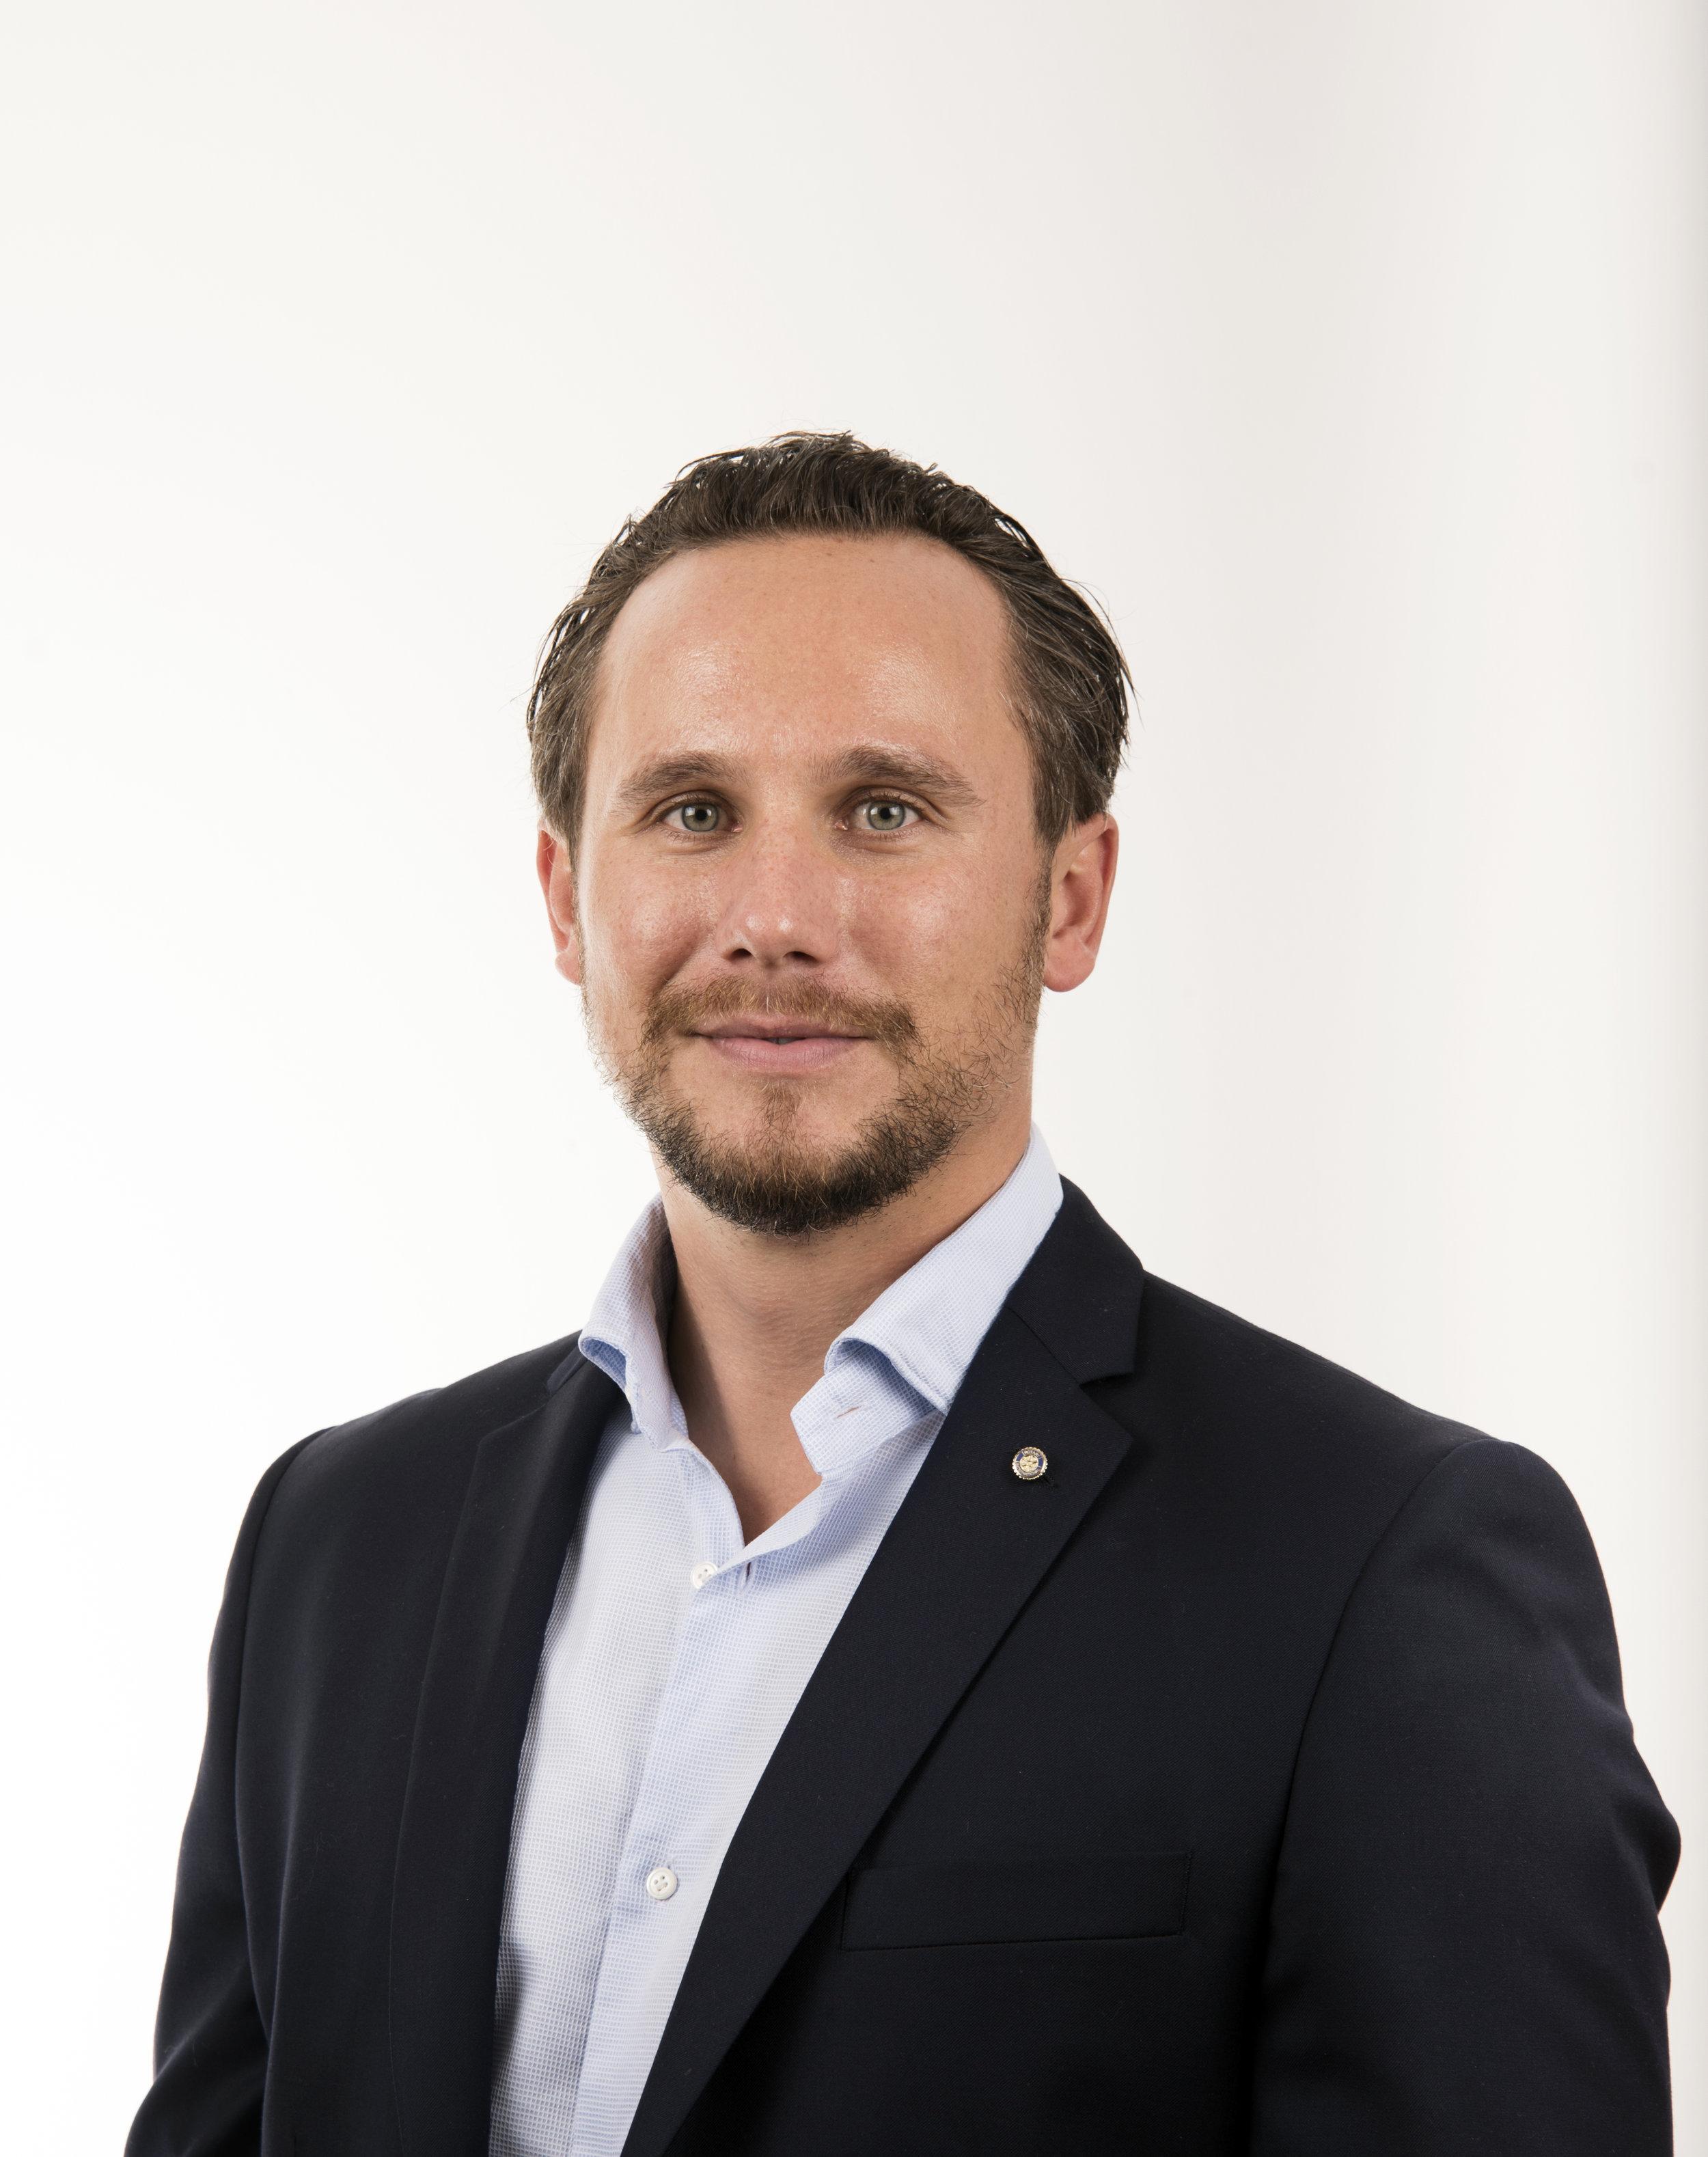 Patrik Lobe, CEO